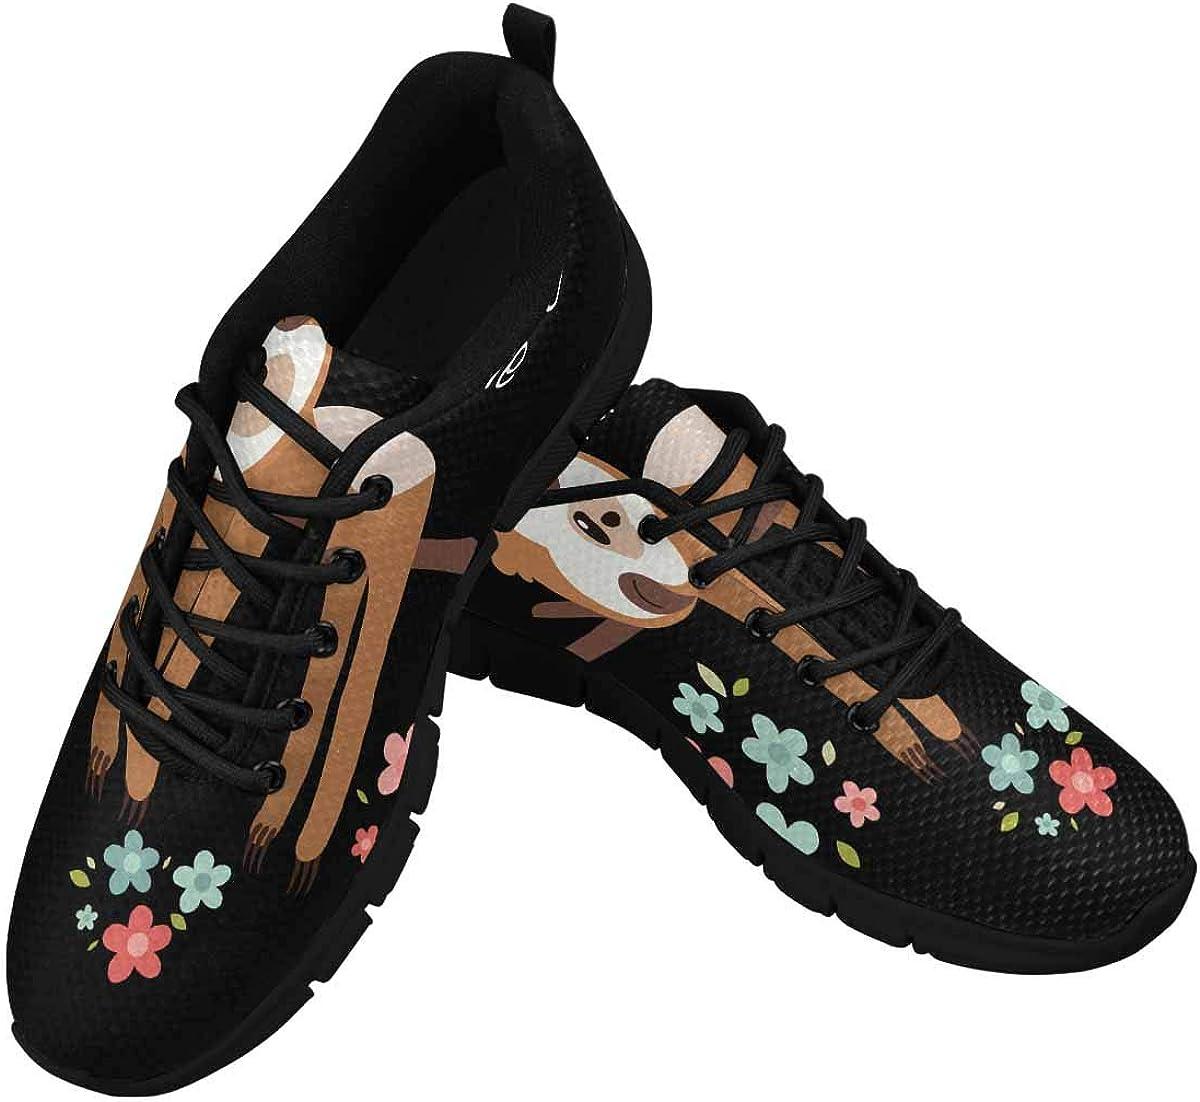 InterestPrint Cute Sleeping Sloth Women's Athletic Walking Shoes Comfort Mesh Non Slip